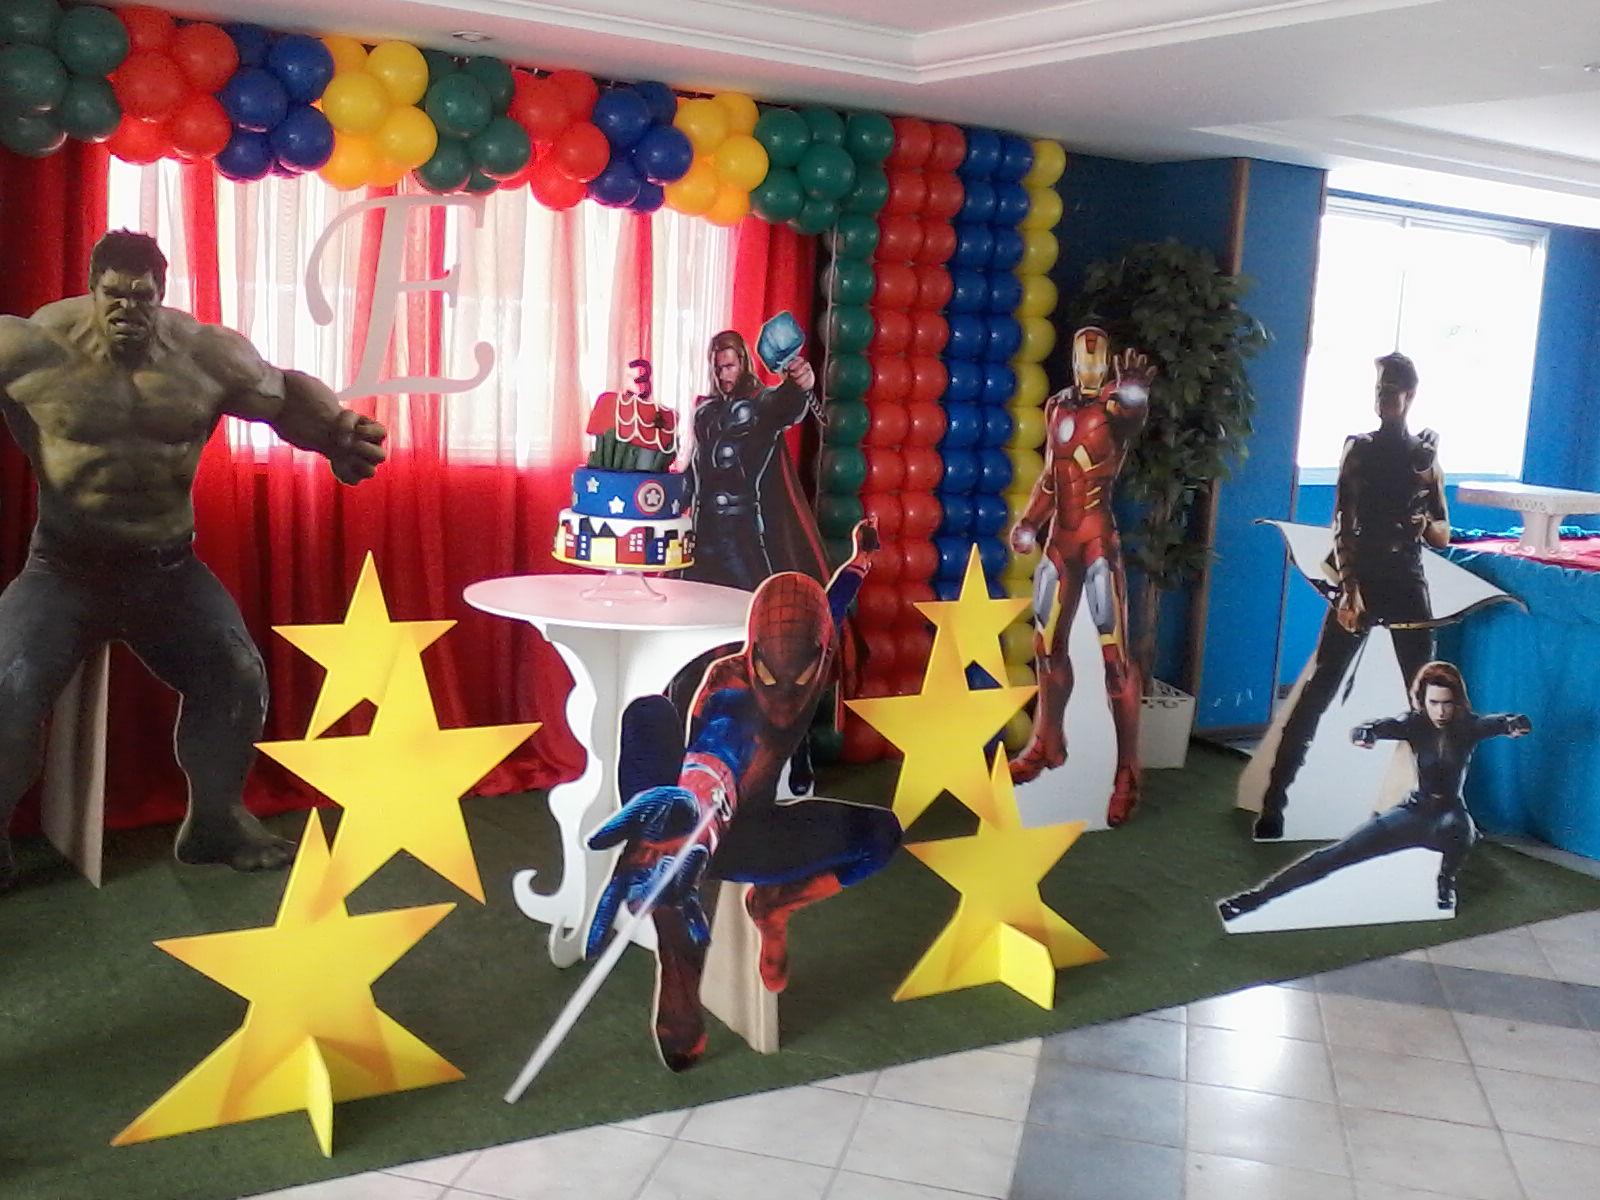 decoracao festa surpresa : decoracao festa surpresa:Decoração Vingadores Decoração Vingadores Decoração Vingadores